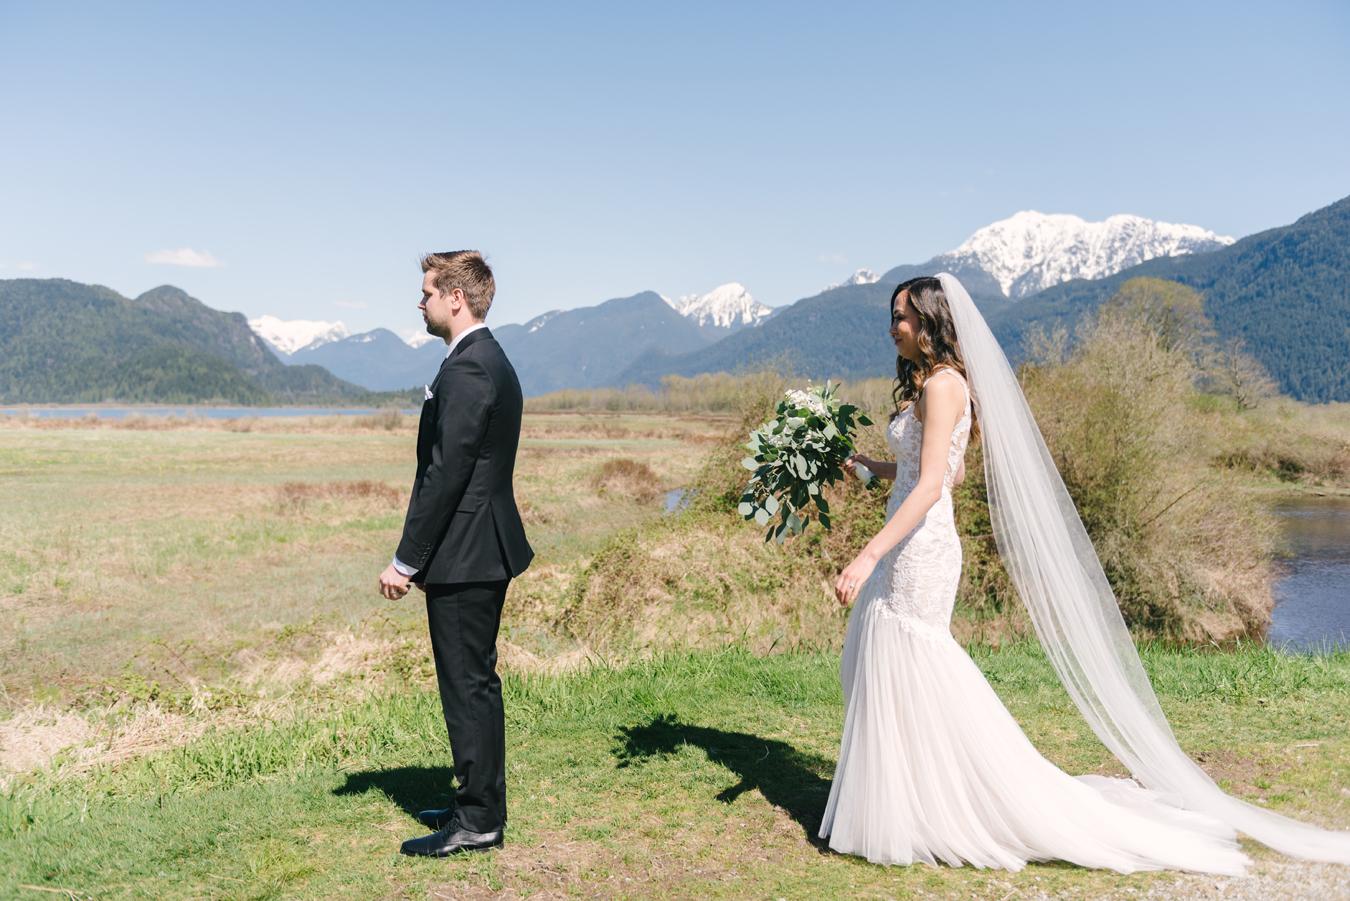 vanouver-wedding-portraits-05.jpg